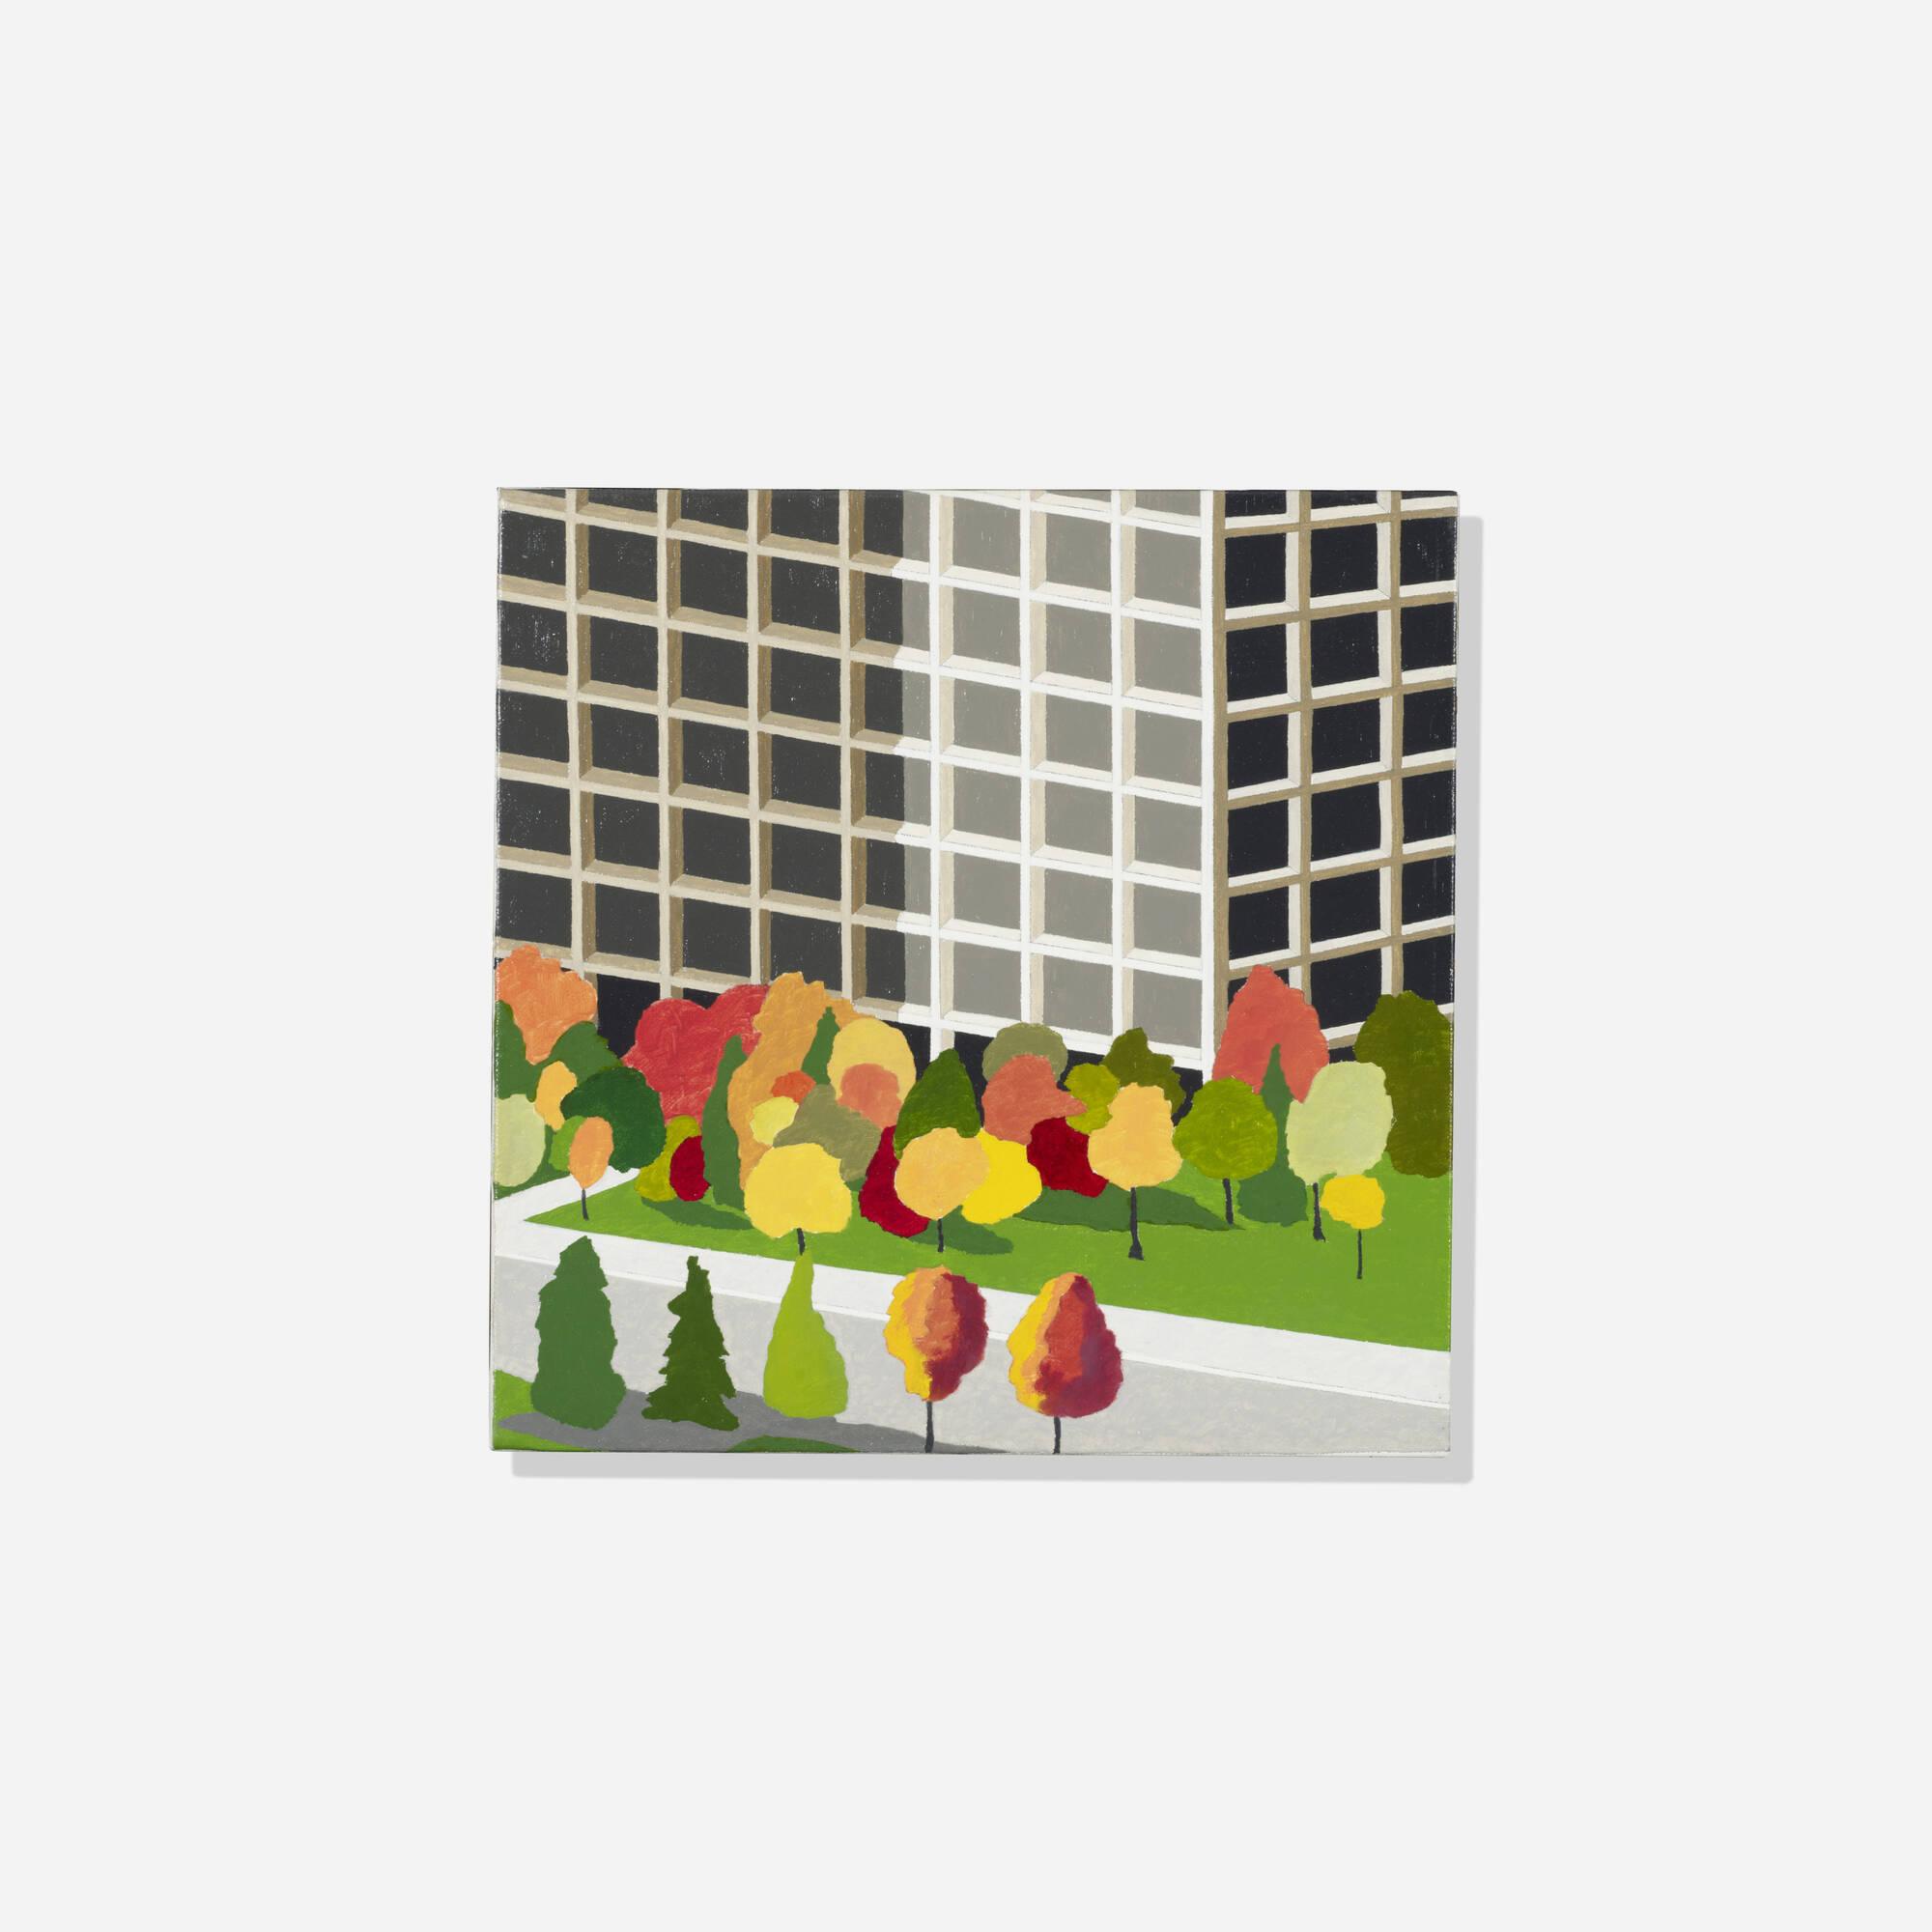 223: Robert Herrmann / Park Place Autumn (1 of 1)